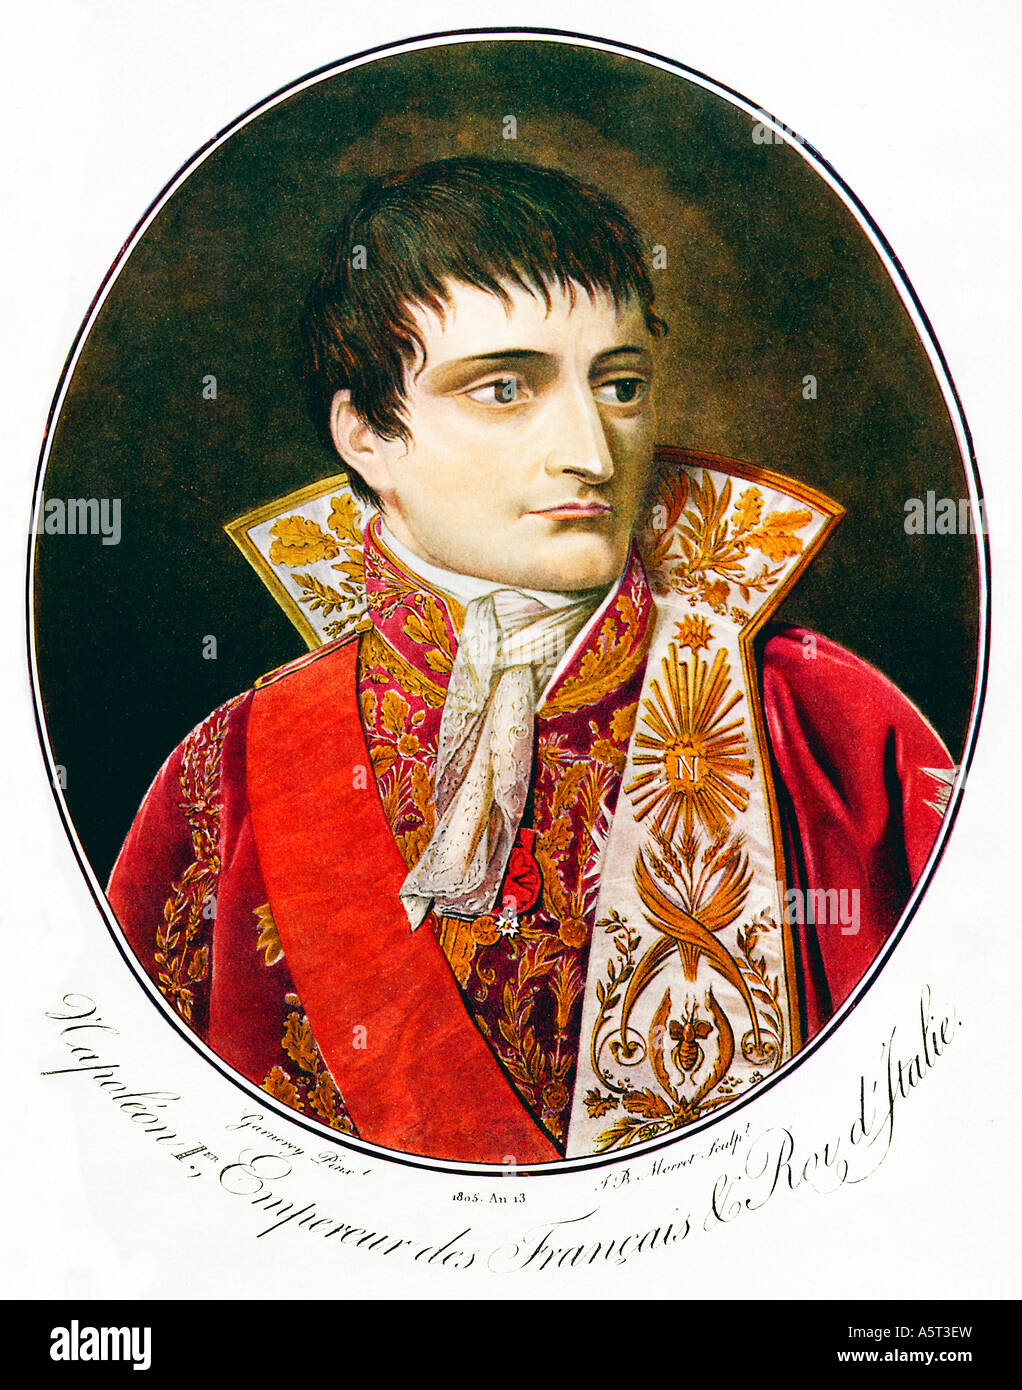 Napoleon 1er Empereur des Francais a portrait by JB Morret after Garnerey from Bonapartes coronation year of 1805 - Stock Image